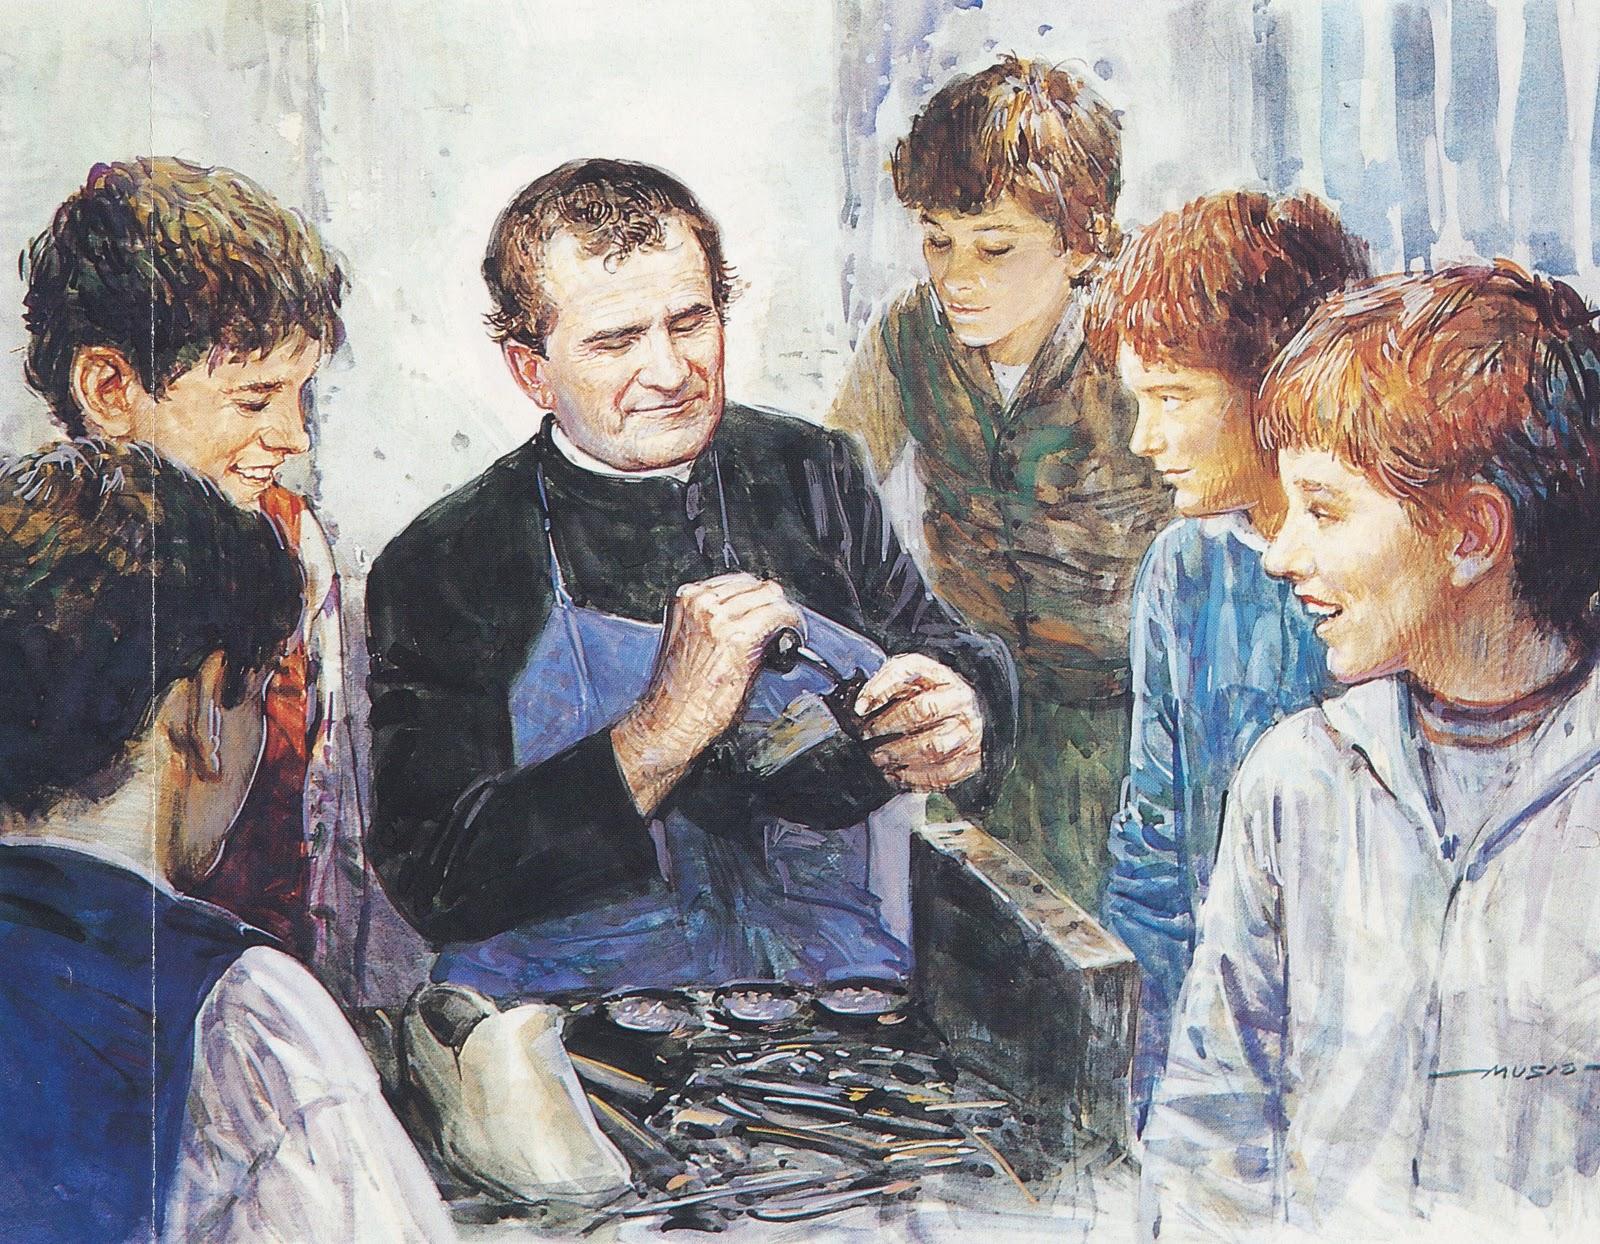 Don Bosco: The Luminous Heart: Learning To Teach Like Don Bosco